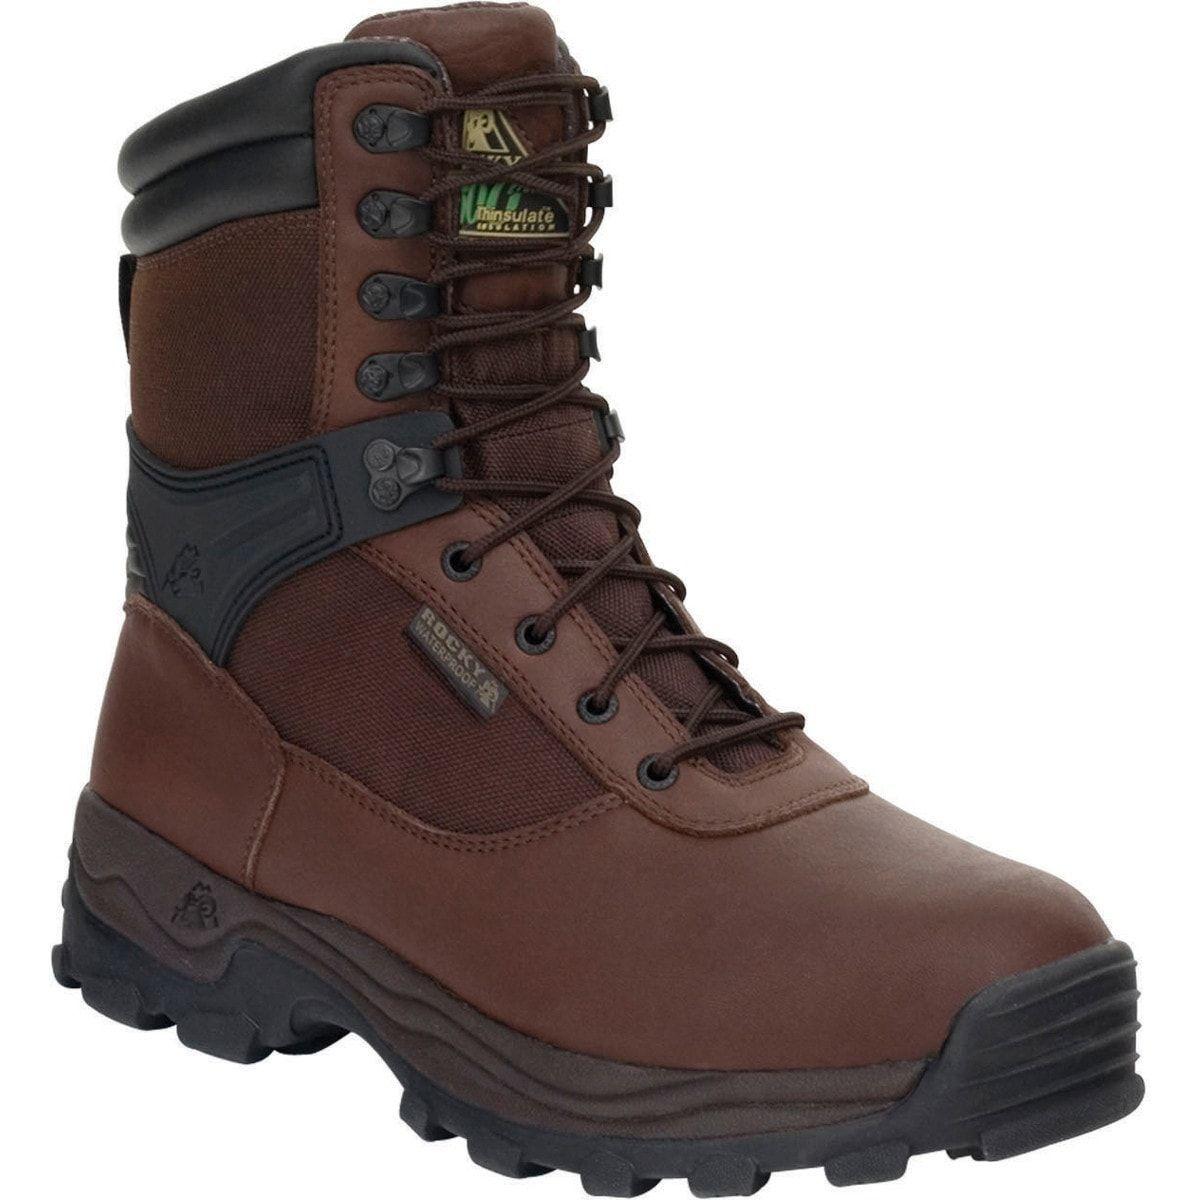 Men's Work Boots For Sale Cat Footwear Salvo 8 Inch ST Men Dark Brown Waterproof 89785 Factory Sale